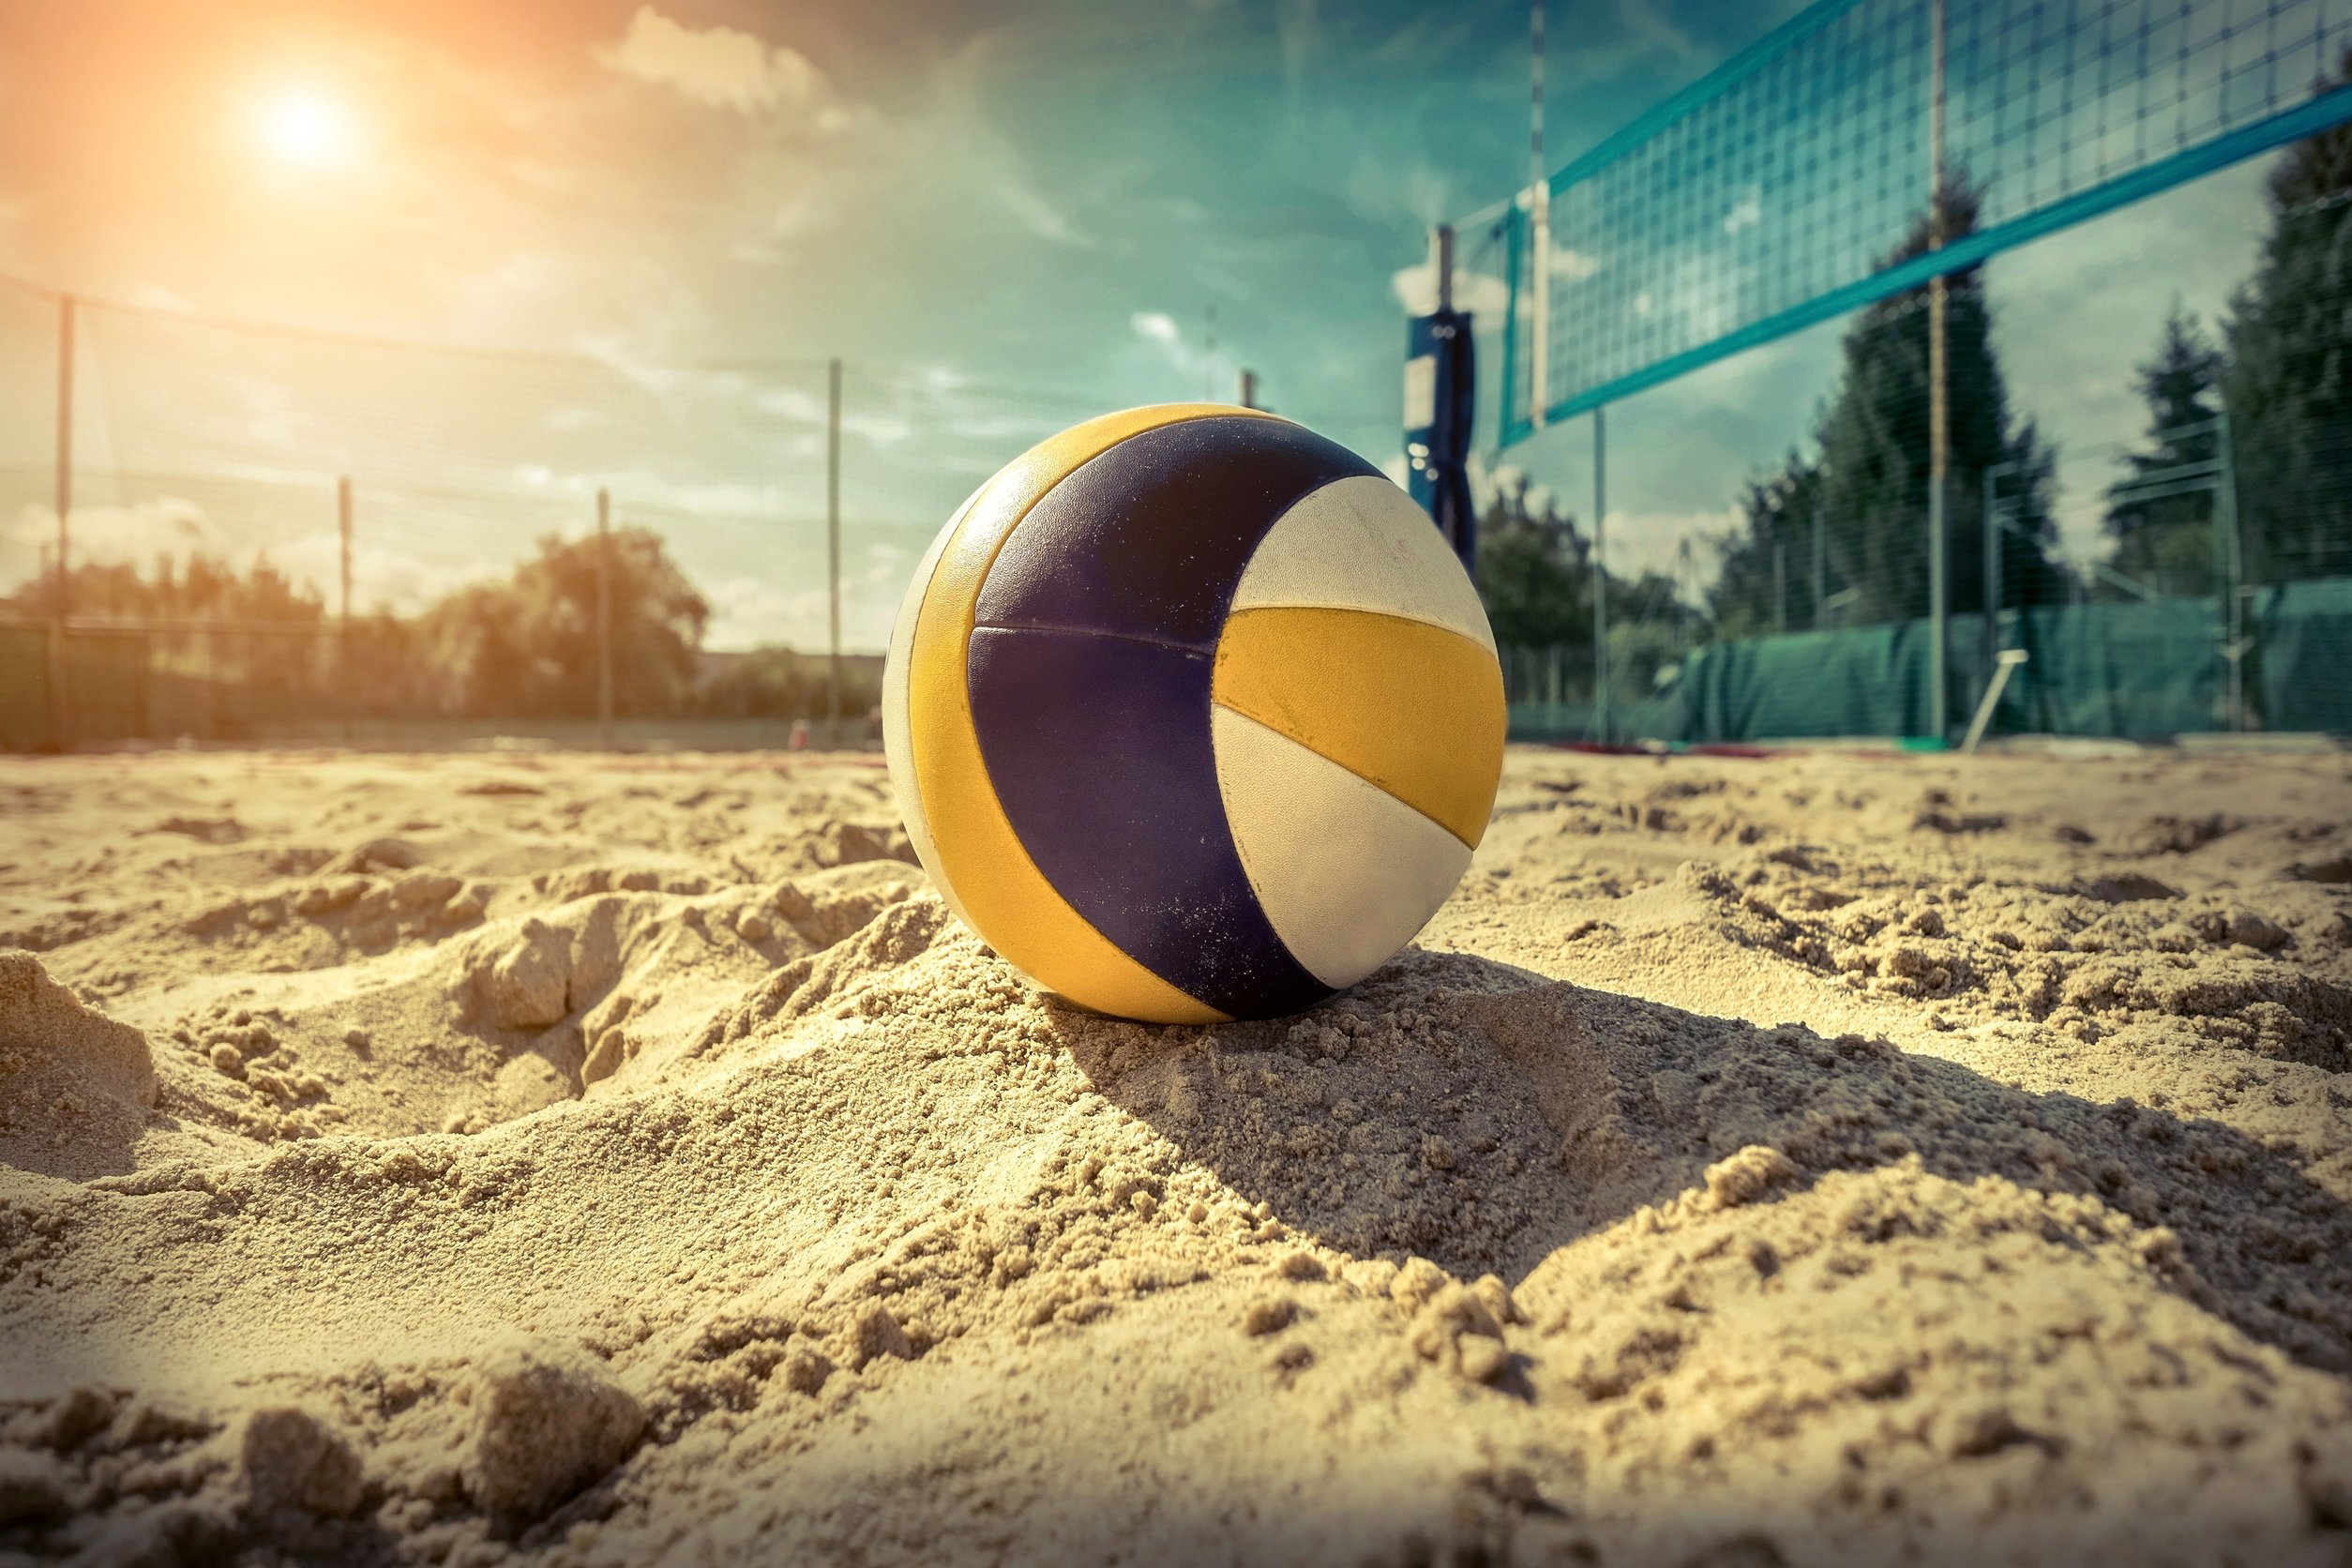 Beach Volleyball - Beach Games